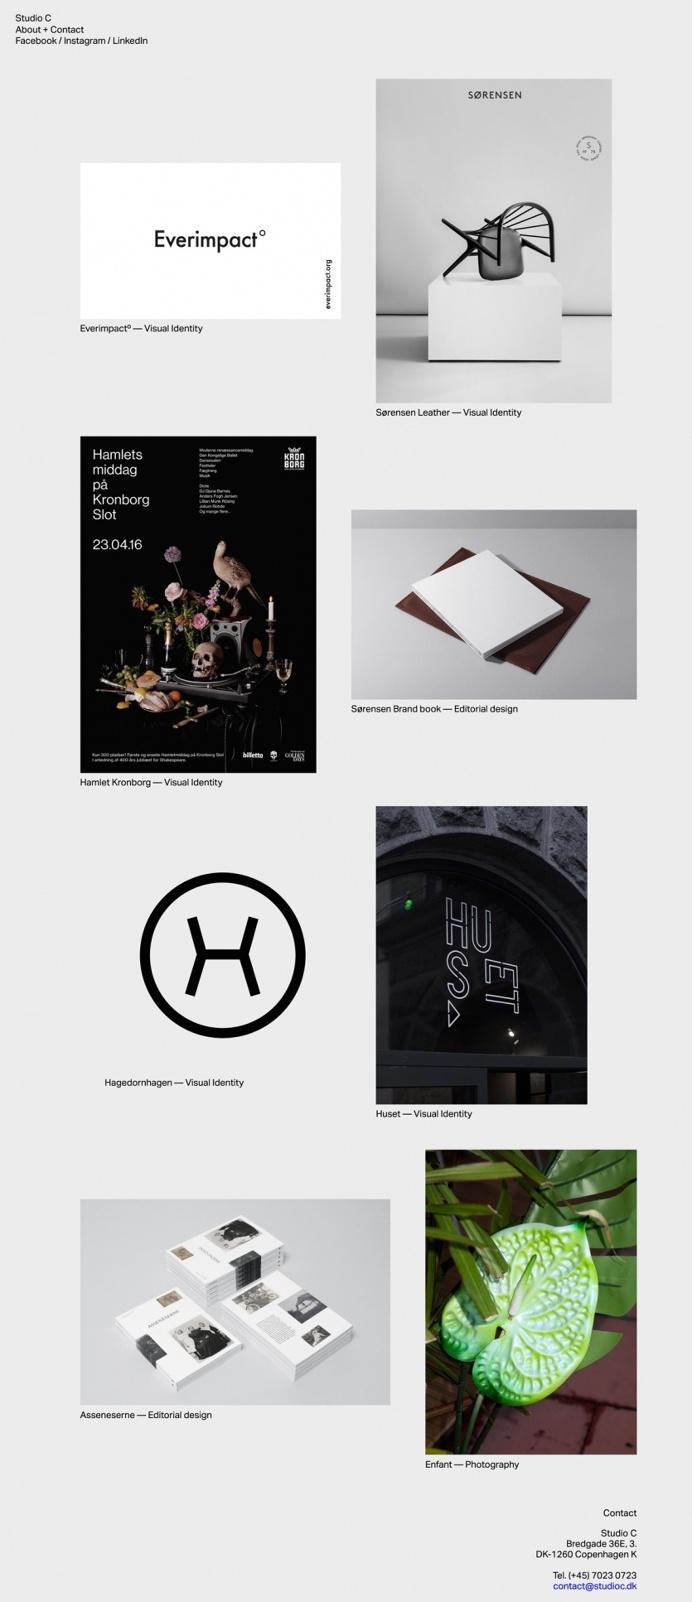 studioc.dk digital agency design studio website webdeesign beautiful beauty best awwward award awwwards nice minimal inspiration inspire bes